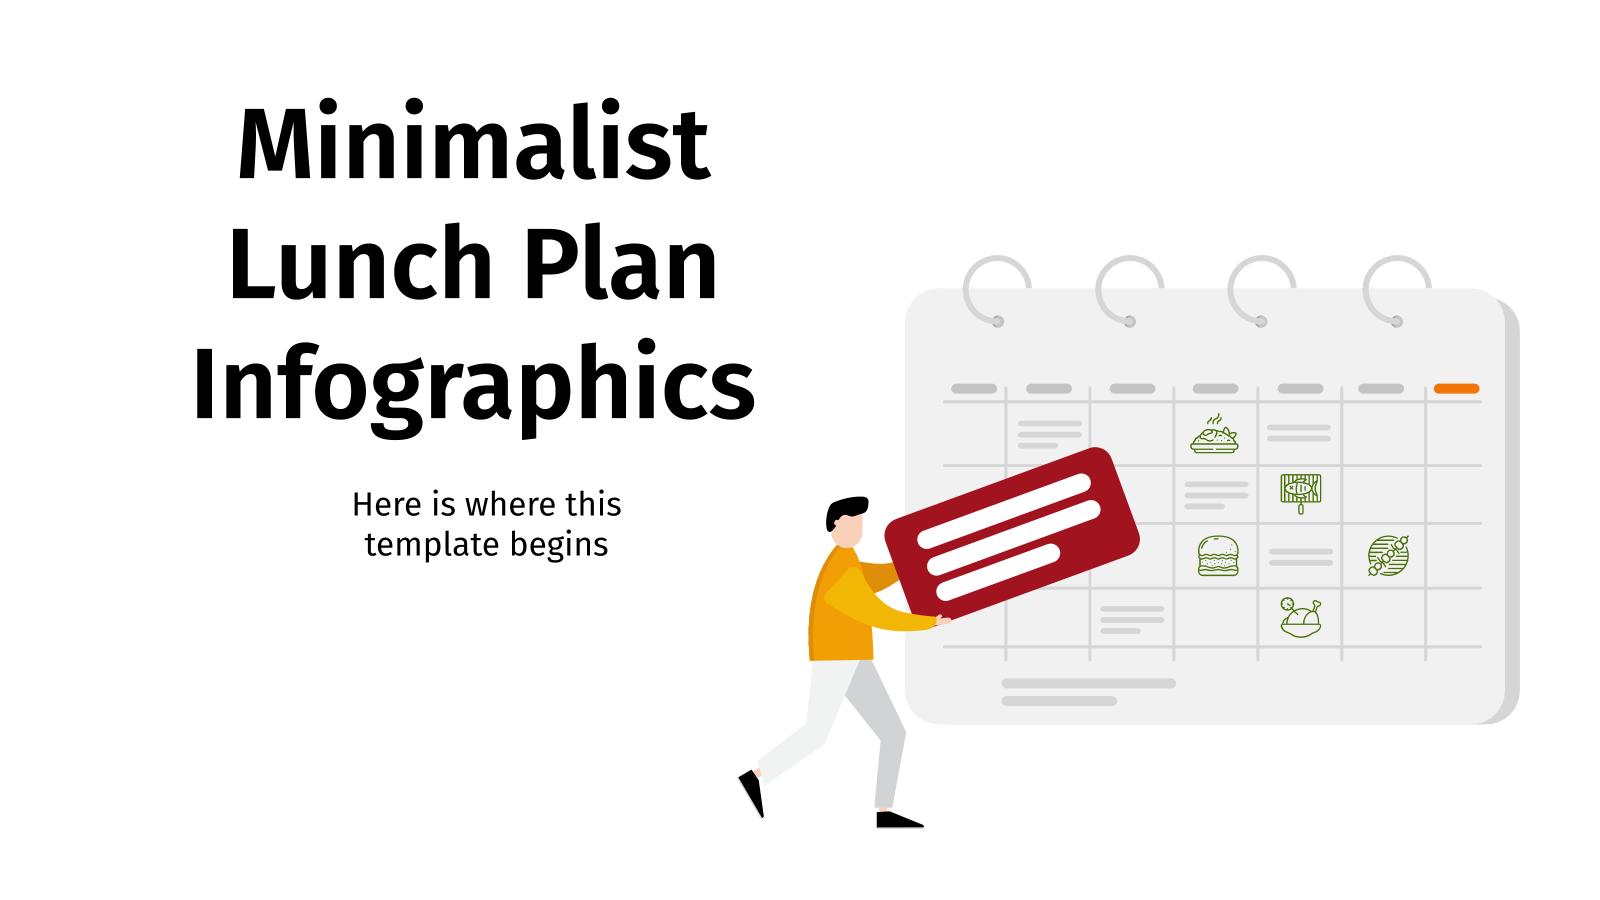 Minimalist Lunch Plan Infographics presentation template